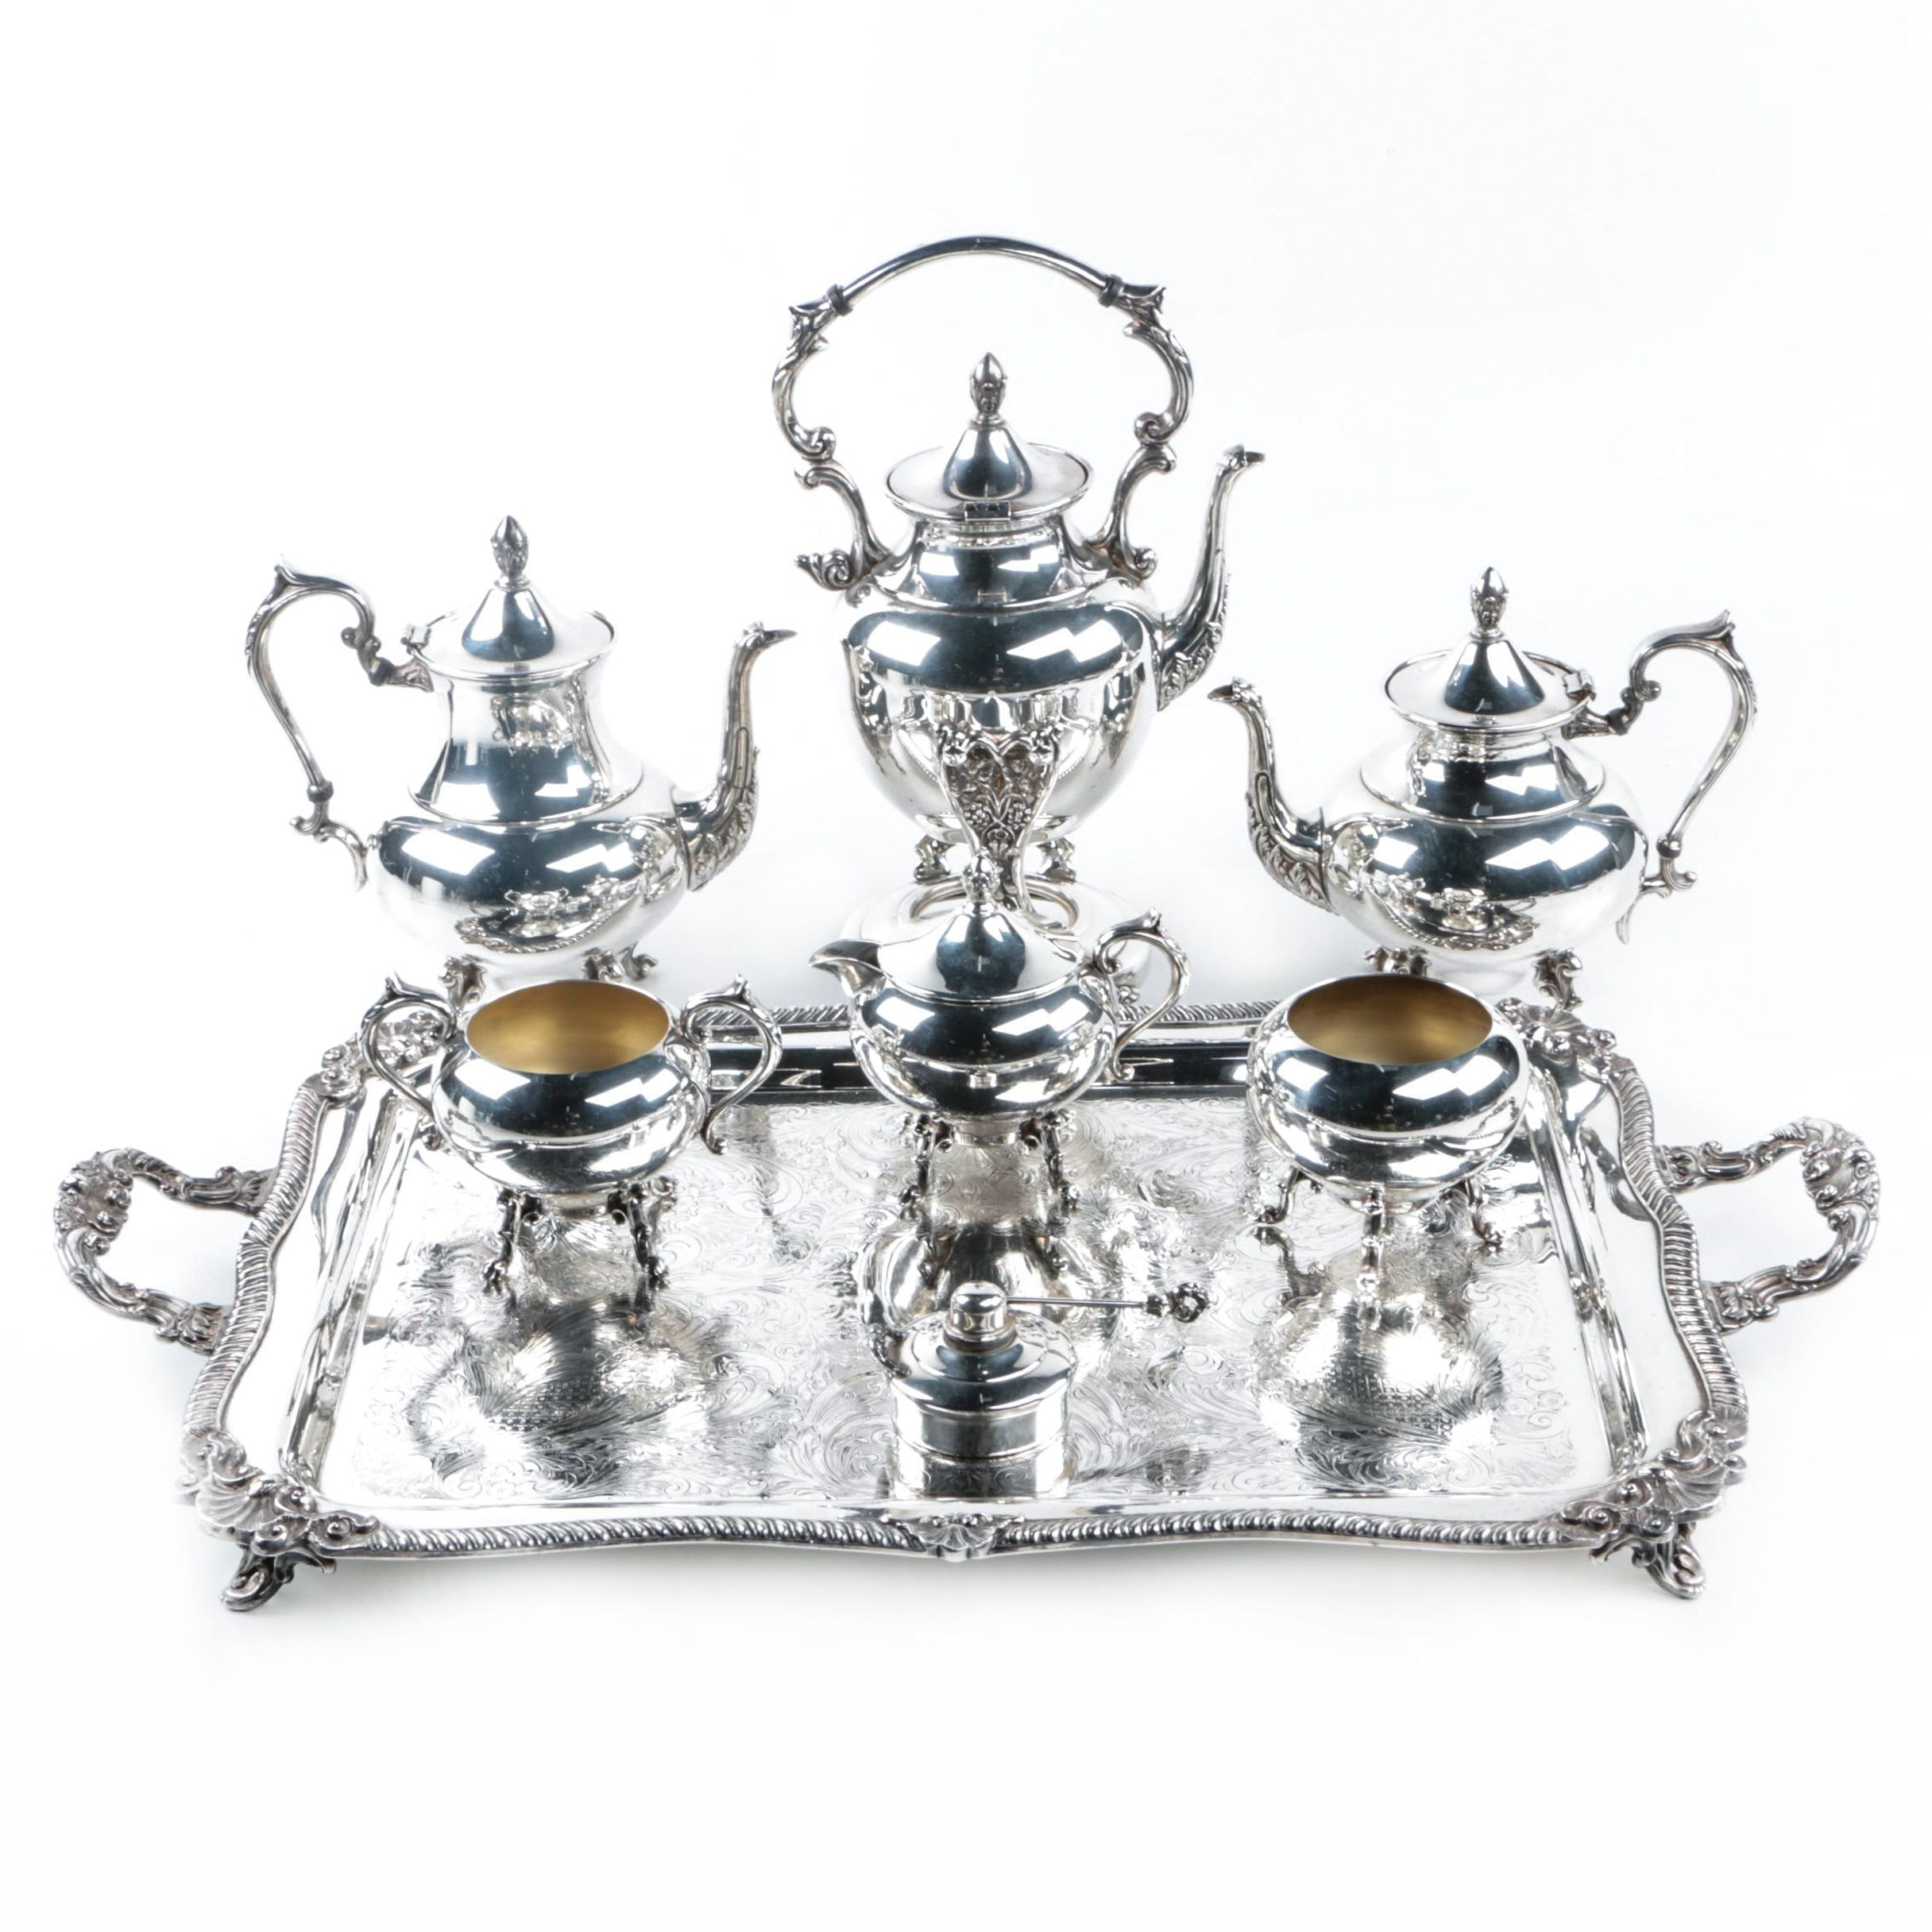 Vintage Silver Plate Tea Service Set